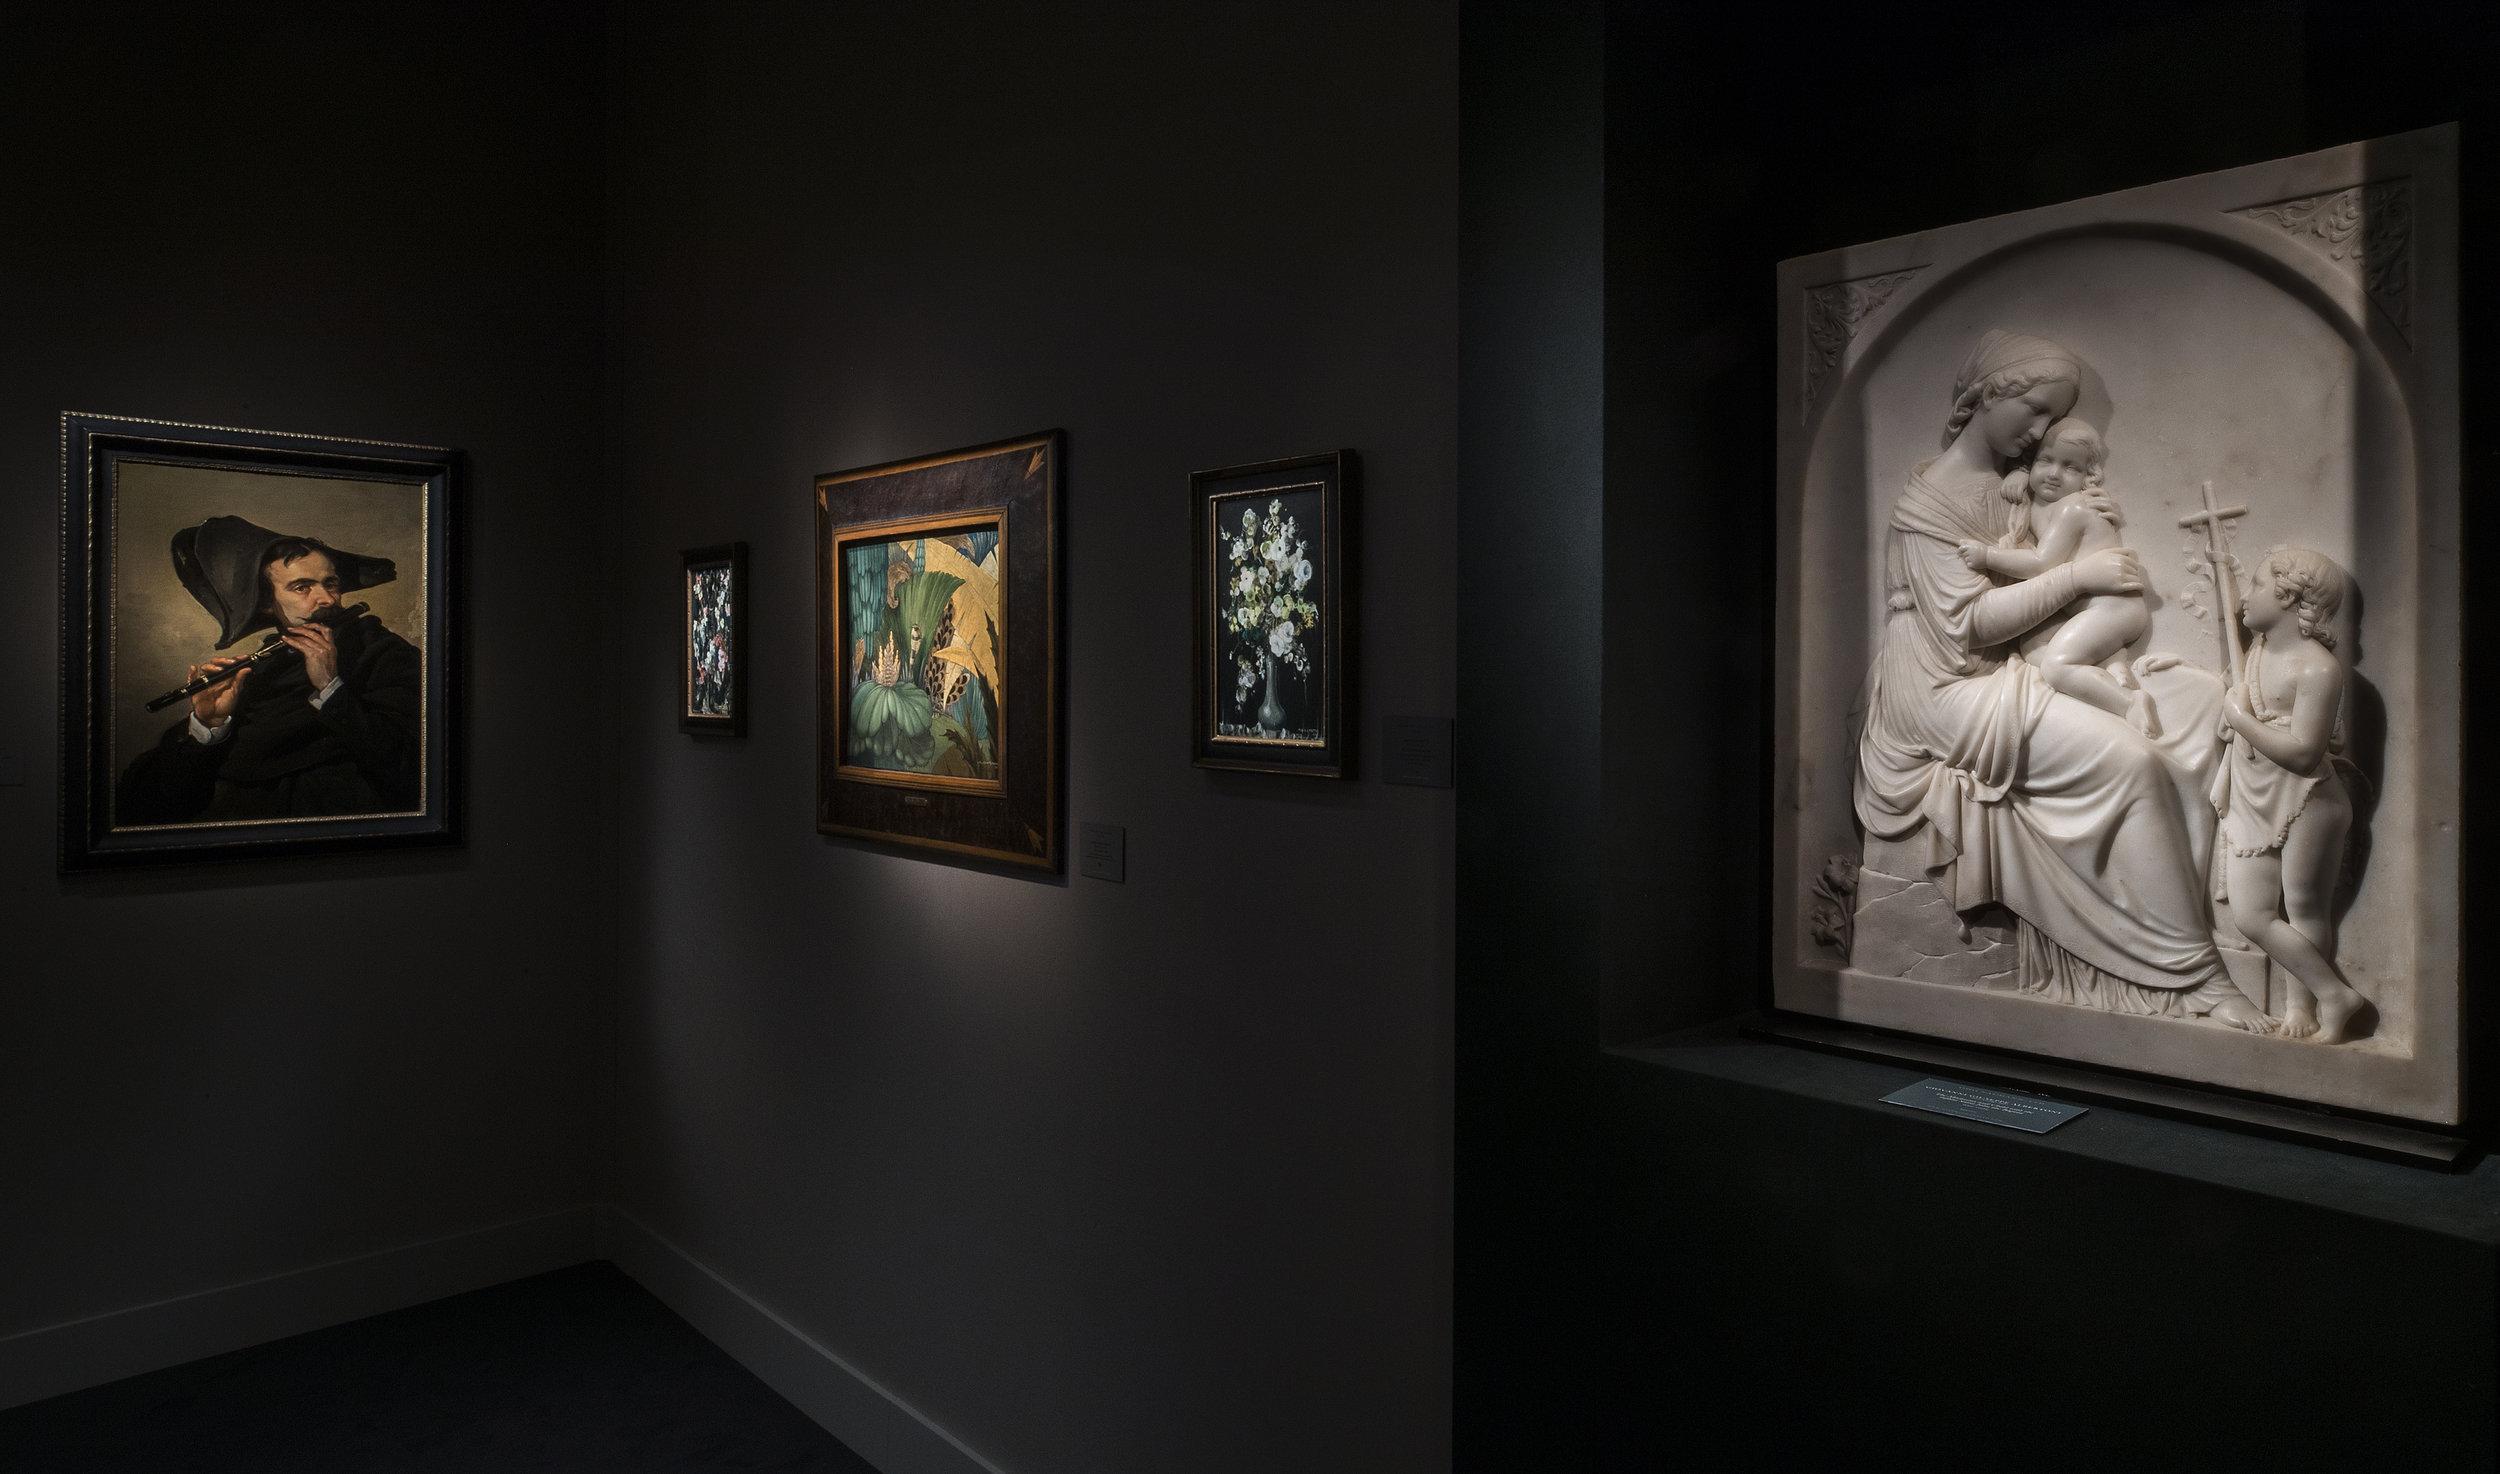 TEFAF 2018 installation view 7